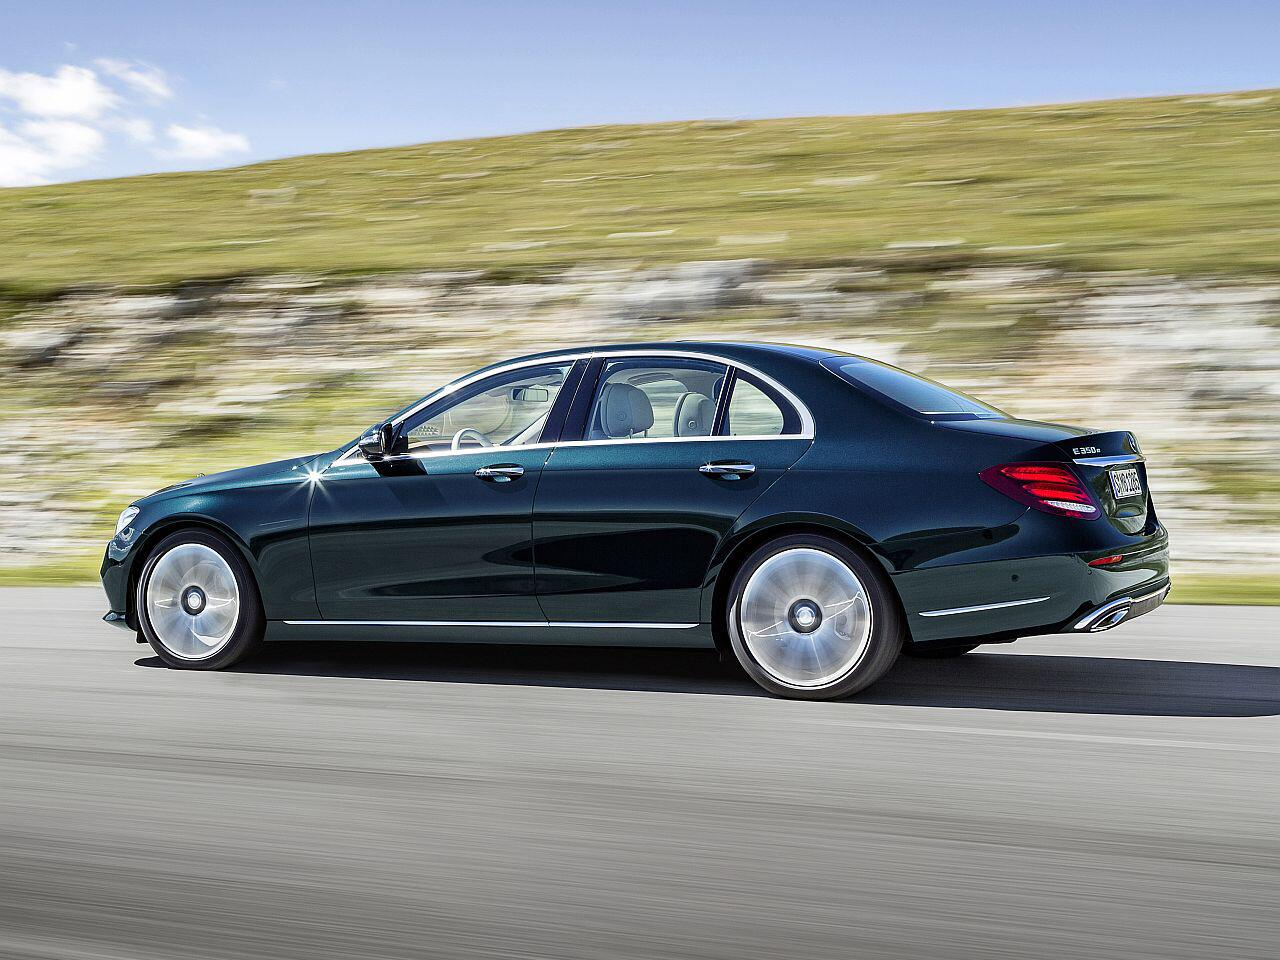 Bild zu Platz 13: Mercedes E-Klasse